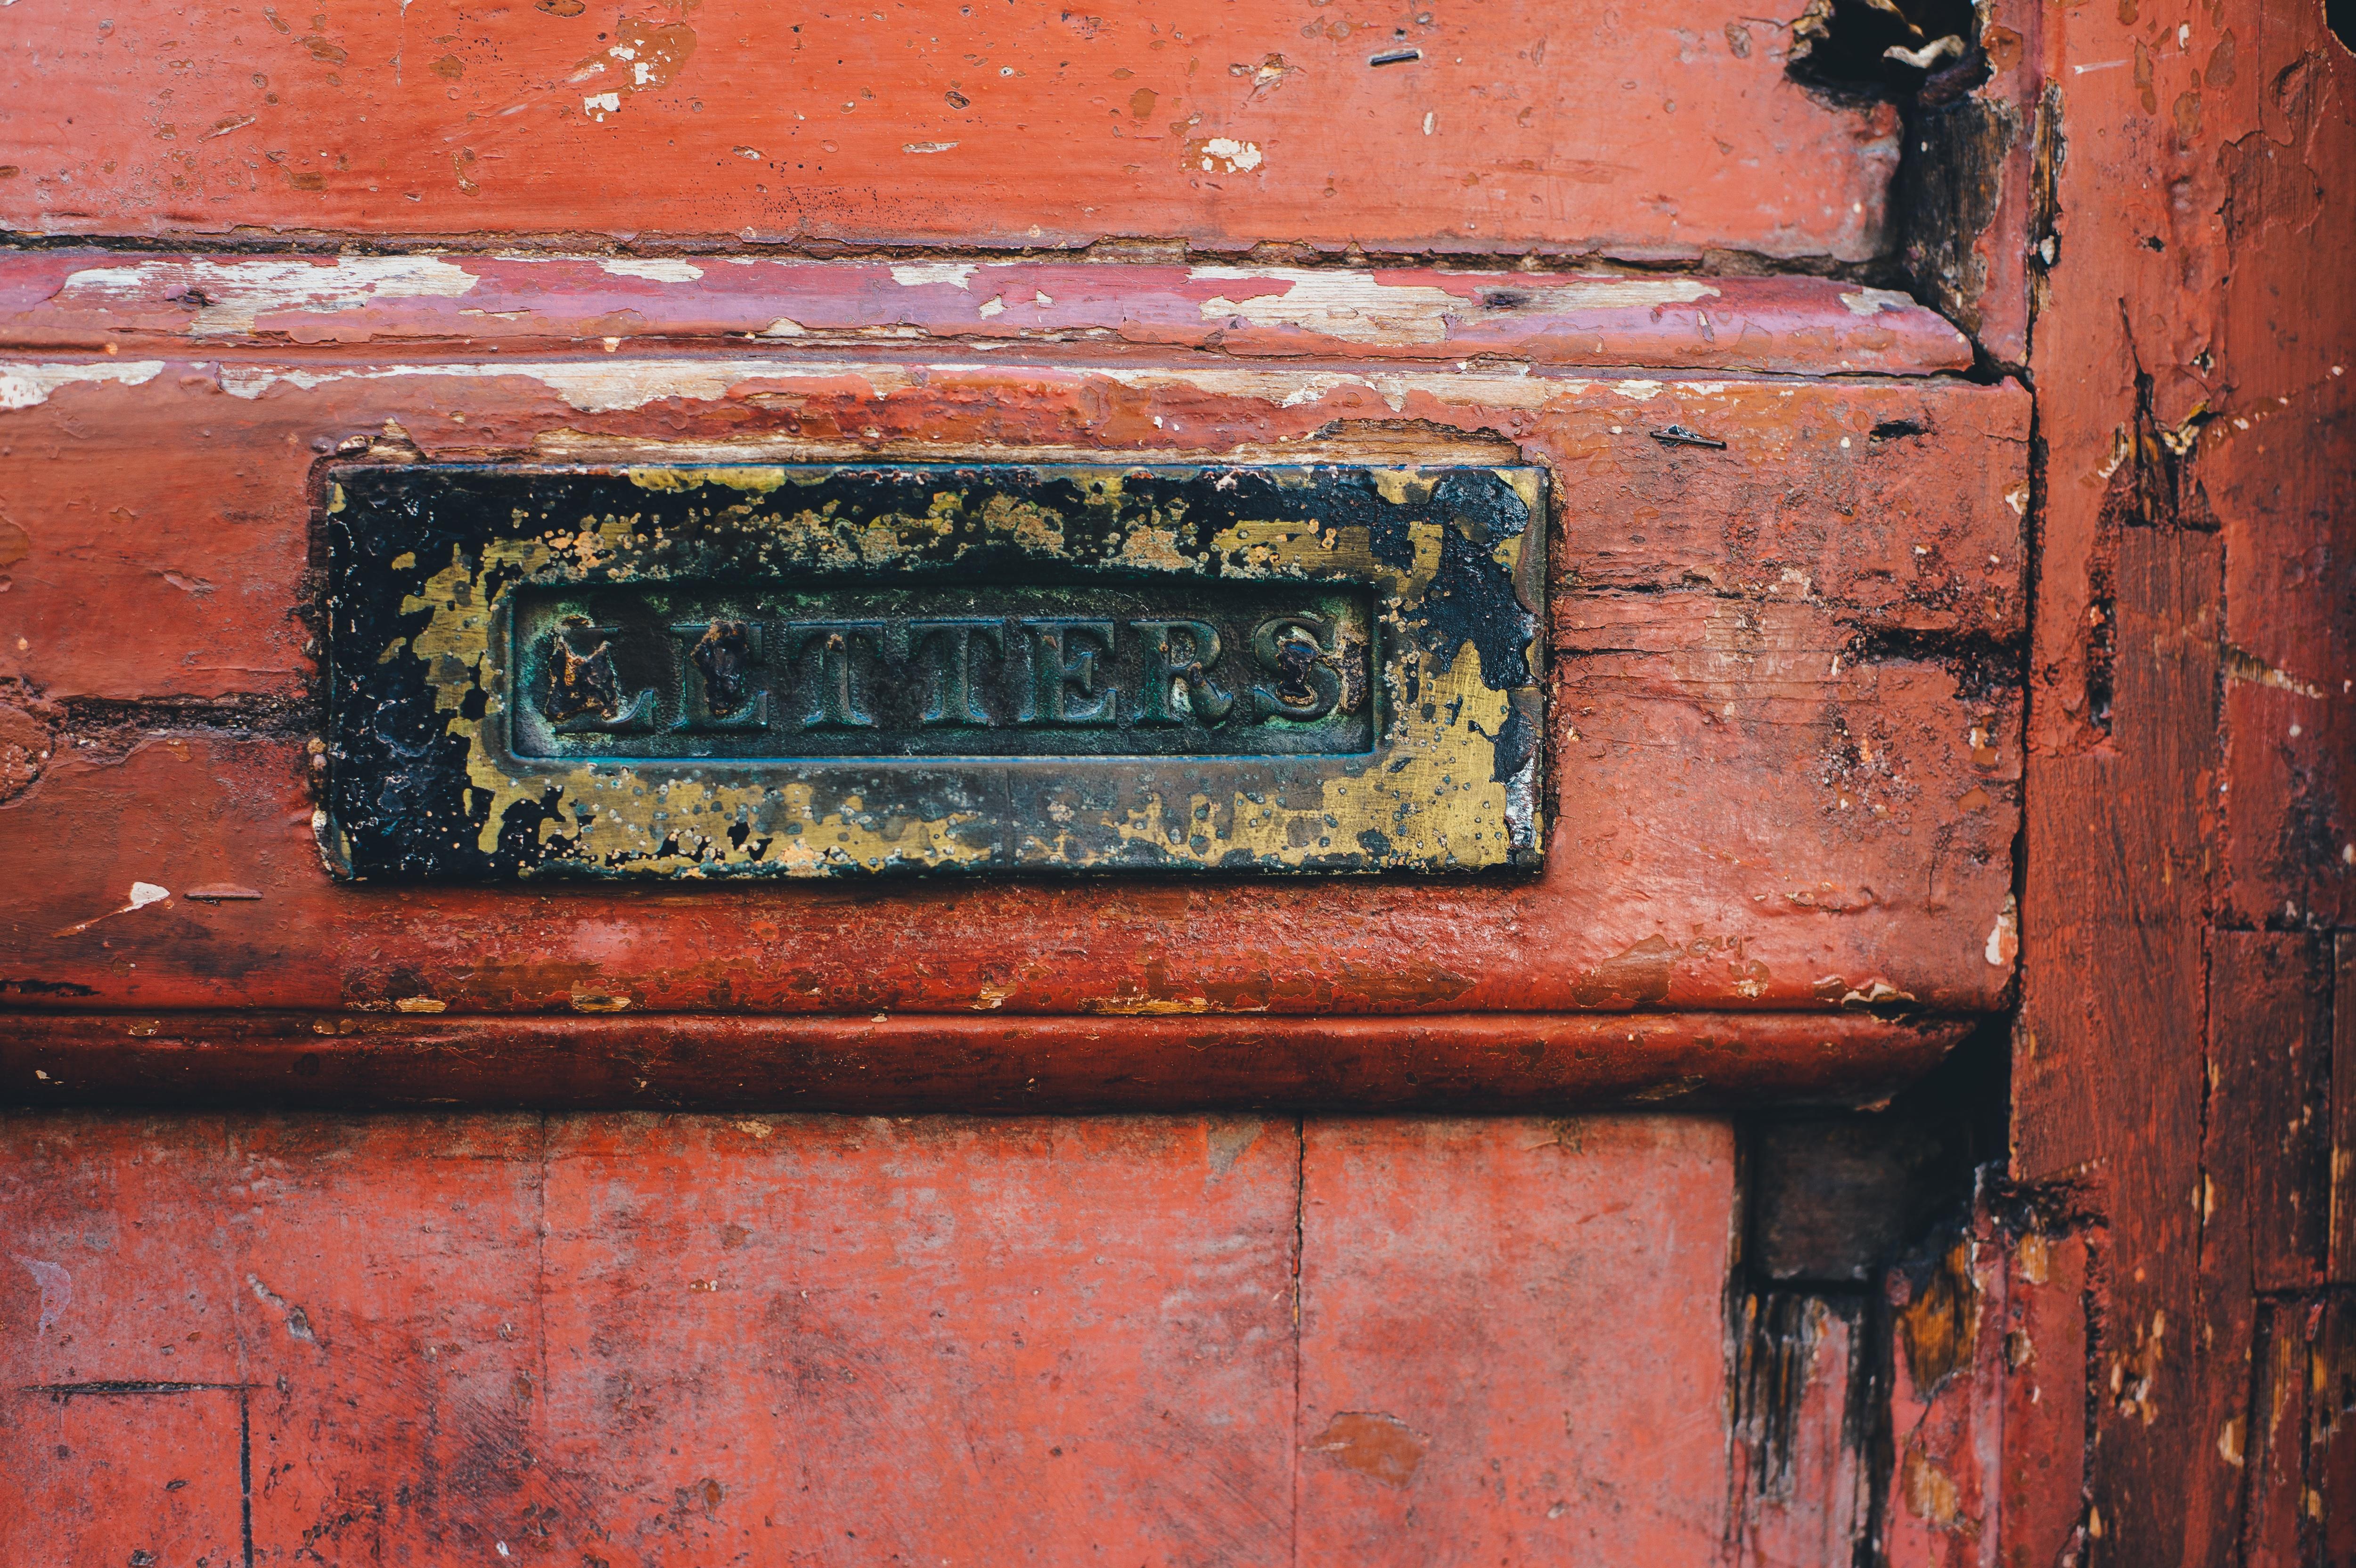 Fotos Gratis Madera Antiguo N Mero Moho Rojo Color Mueble  # Moho Muebles Madera